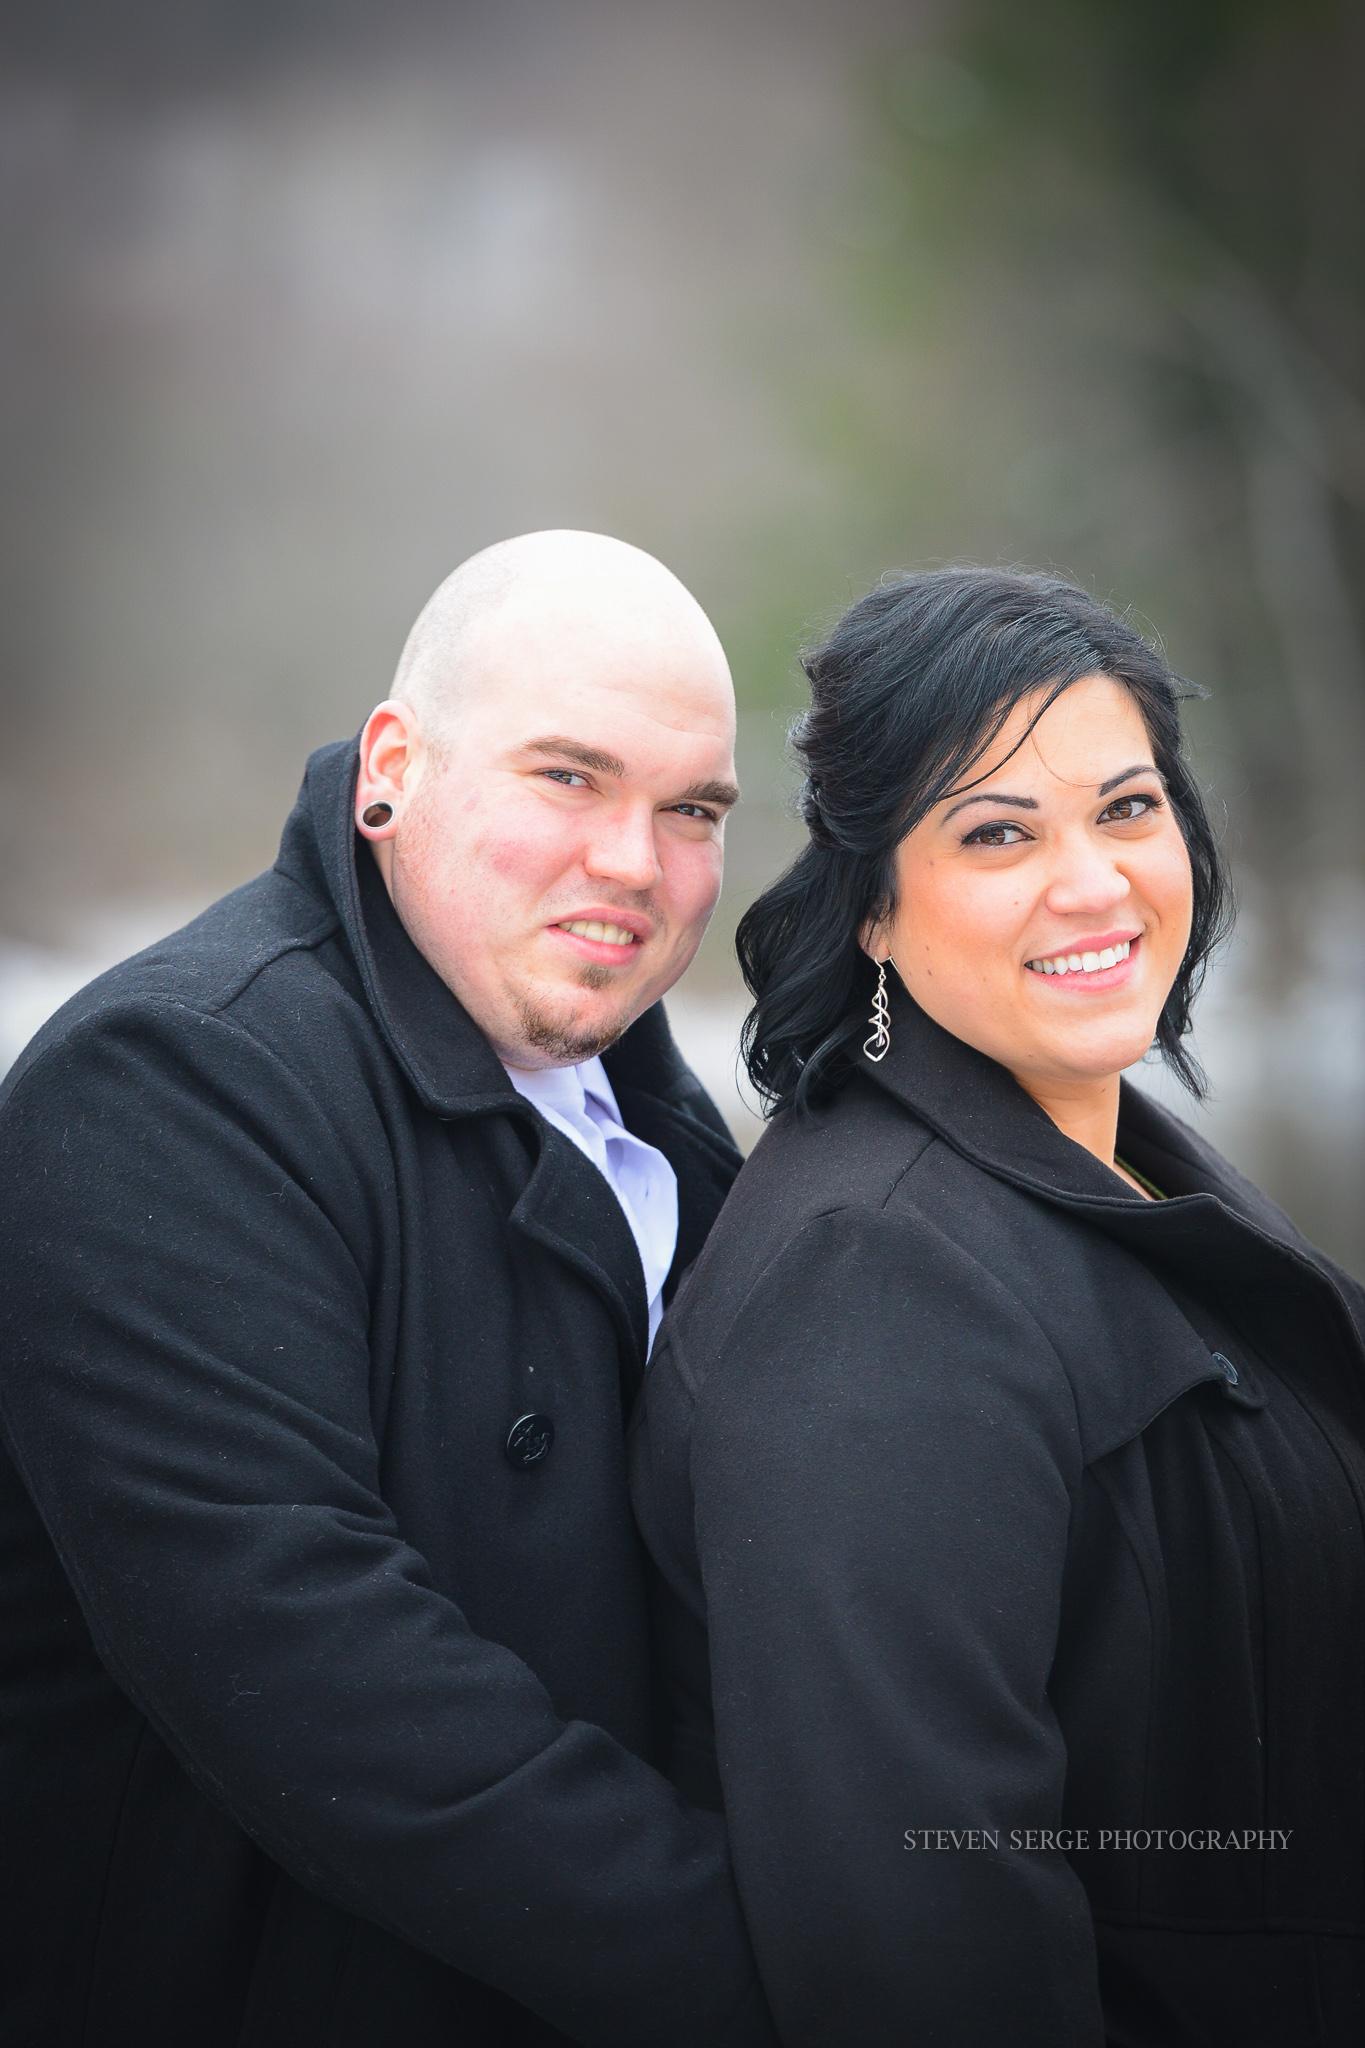 Rosa-NEPA-Wedding-Engagement-Photographer-Waverly-Clarks-Summit-Scranton-Photographer-6.jpg